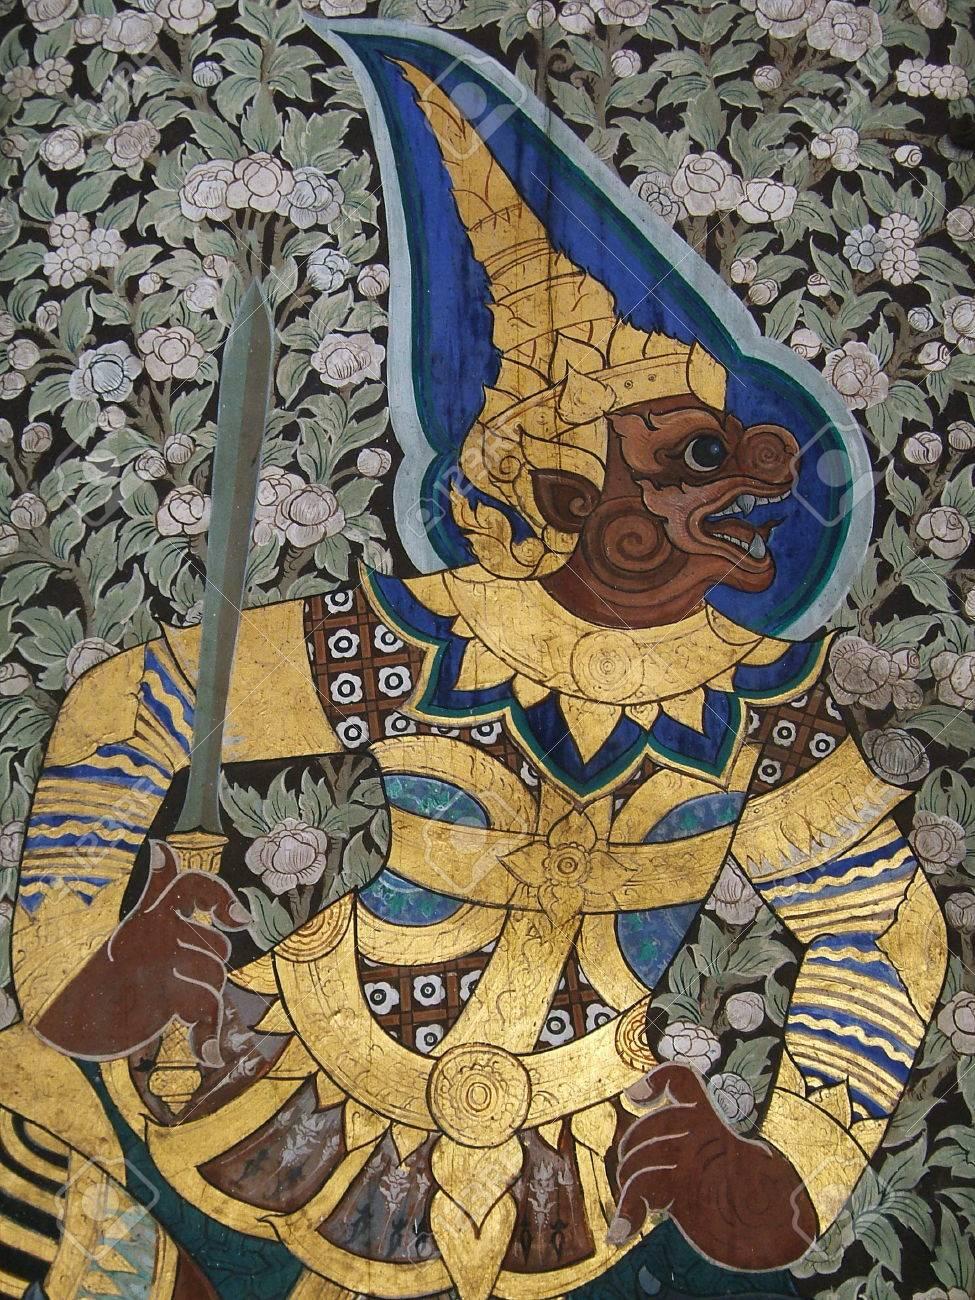 Thai Mural Painting at Wat suthat, ramayana story